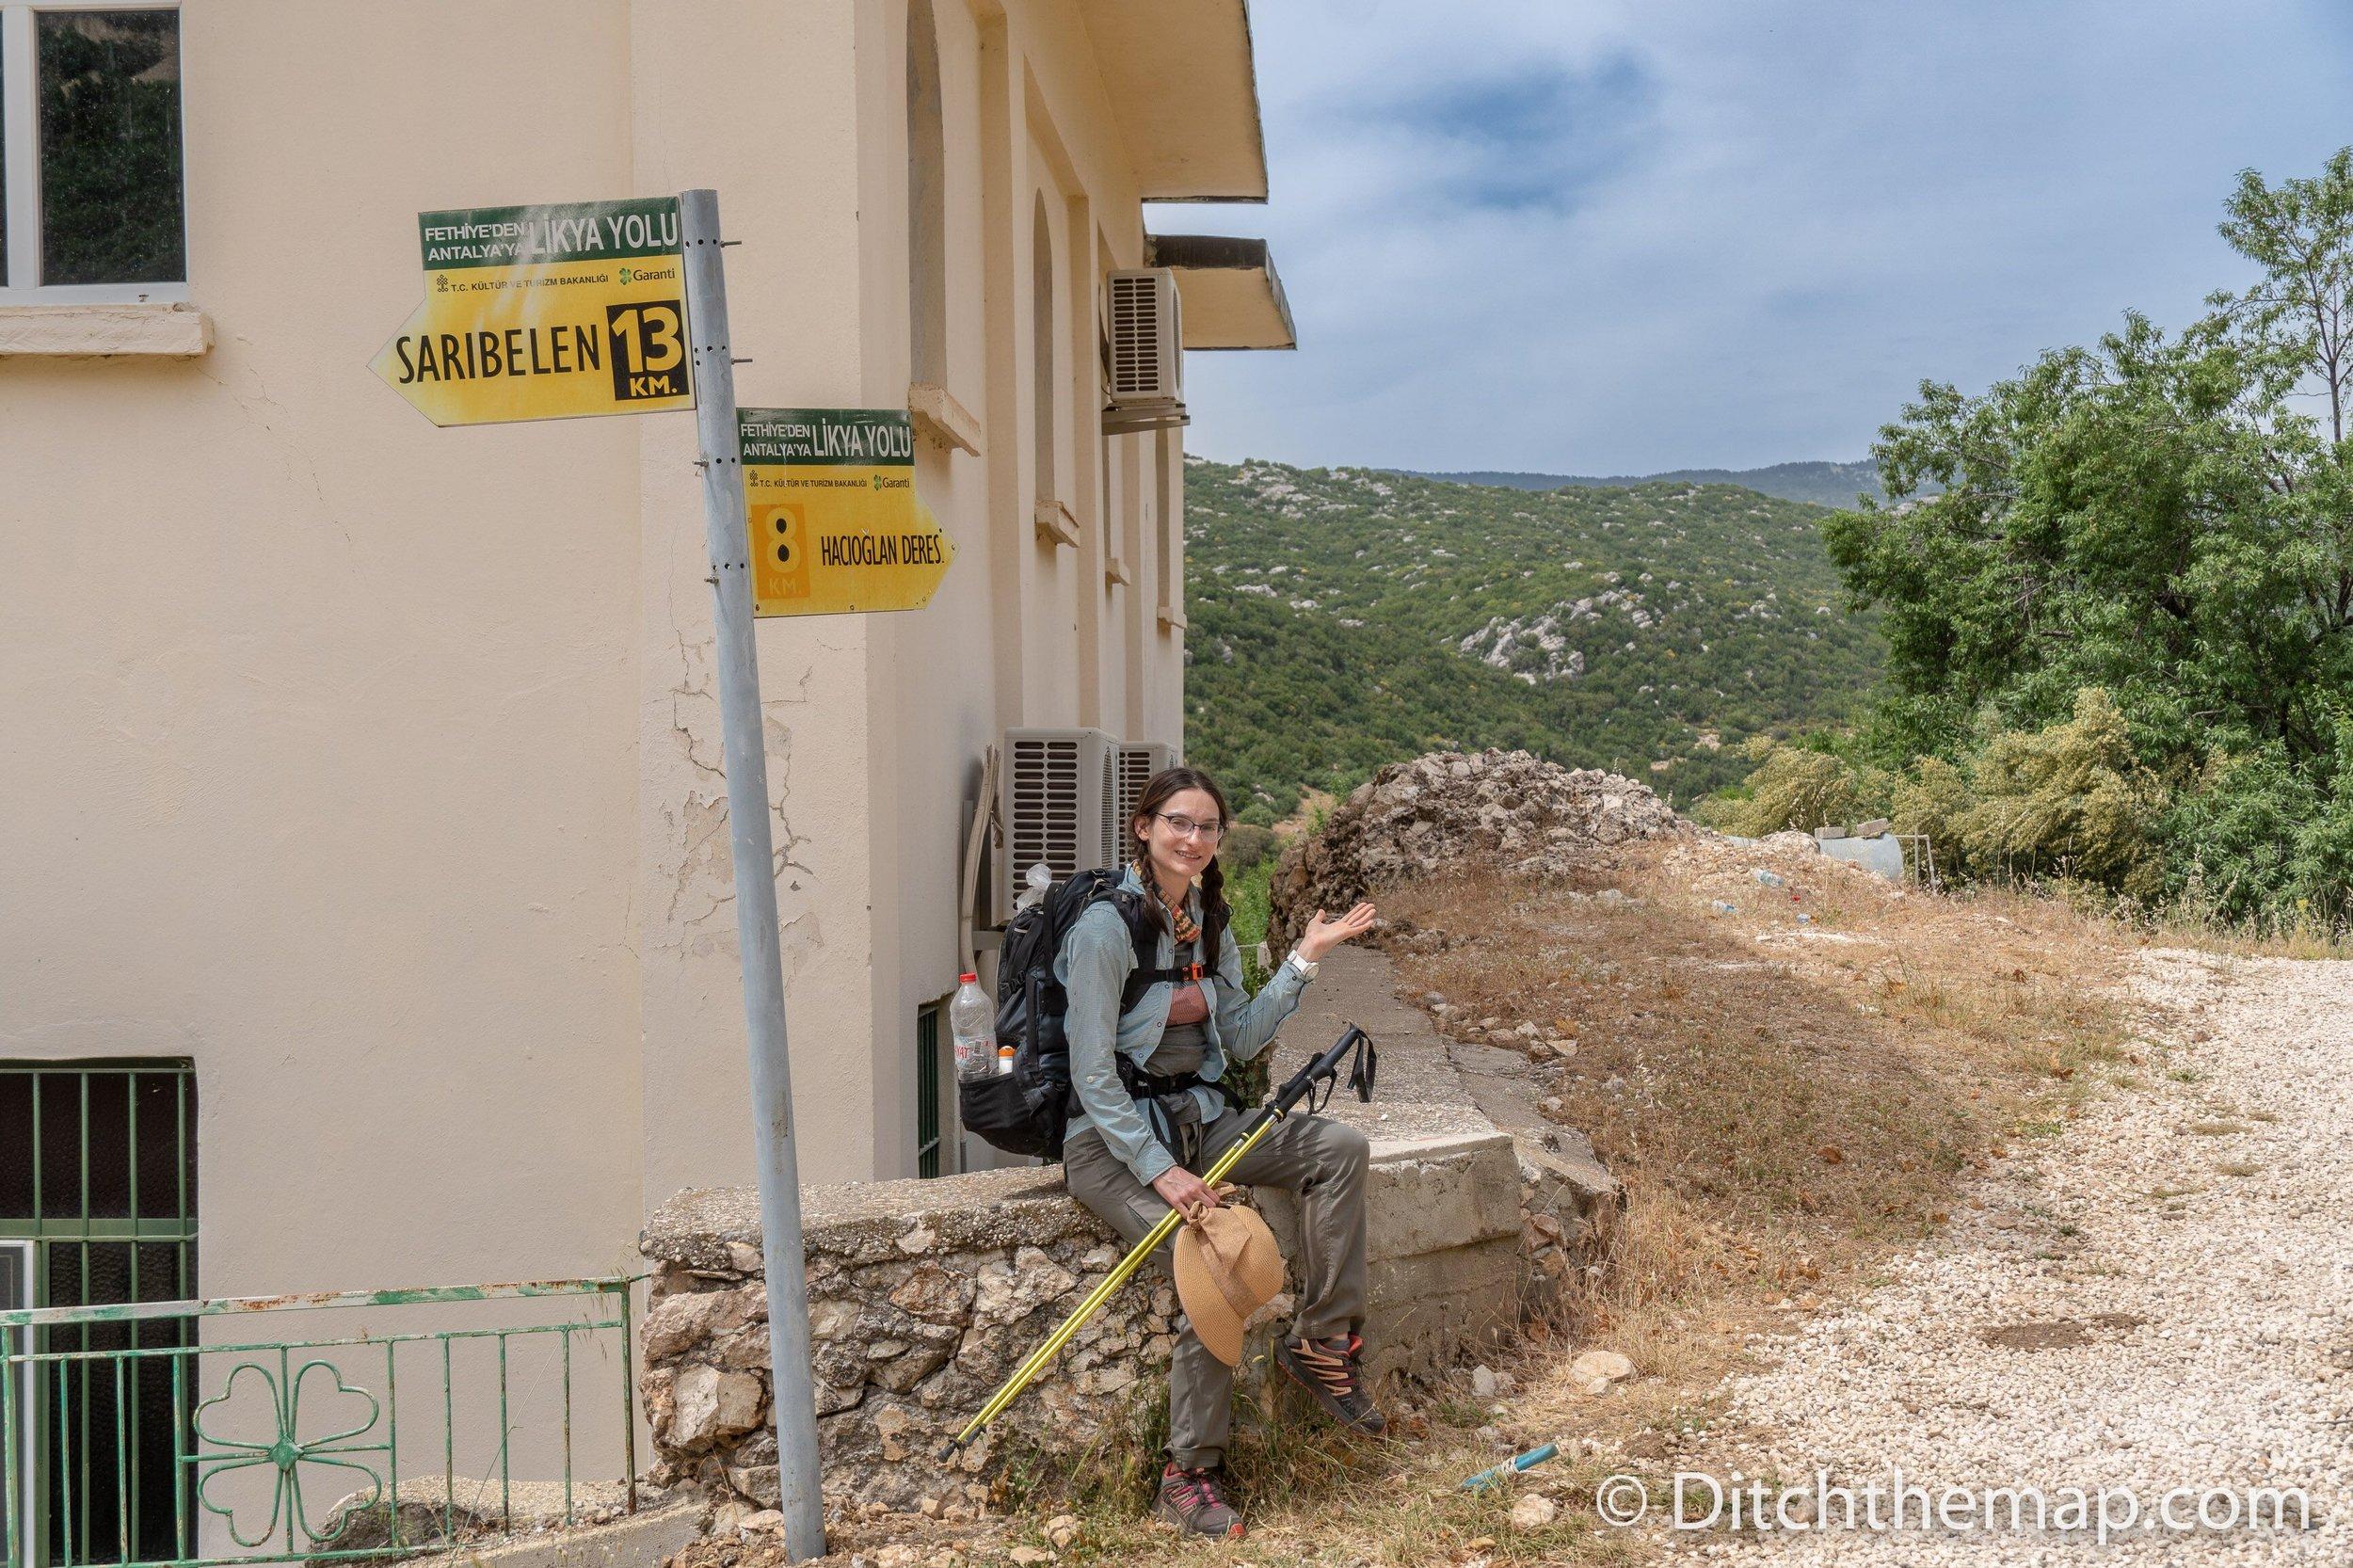 Leaving Gökçeören and continuing toward Hacıoğlan Deresi on the Lycian Way